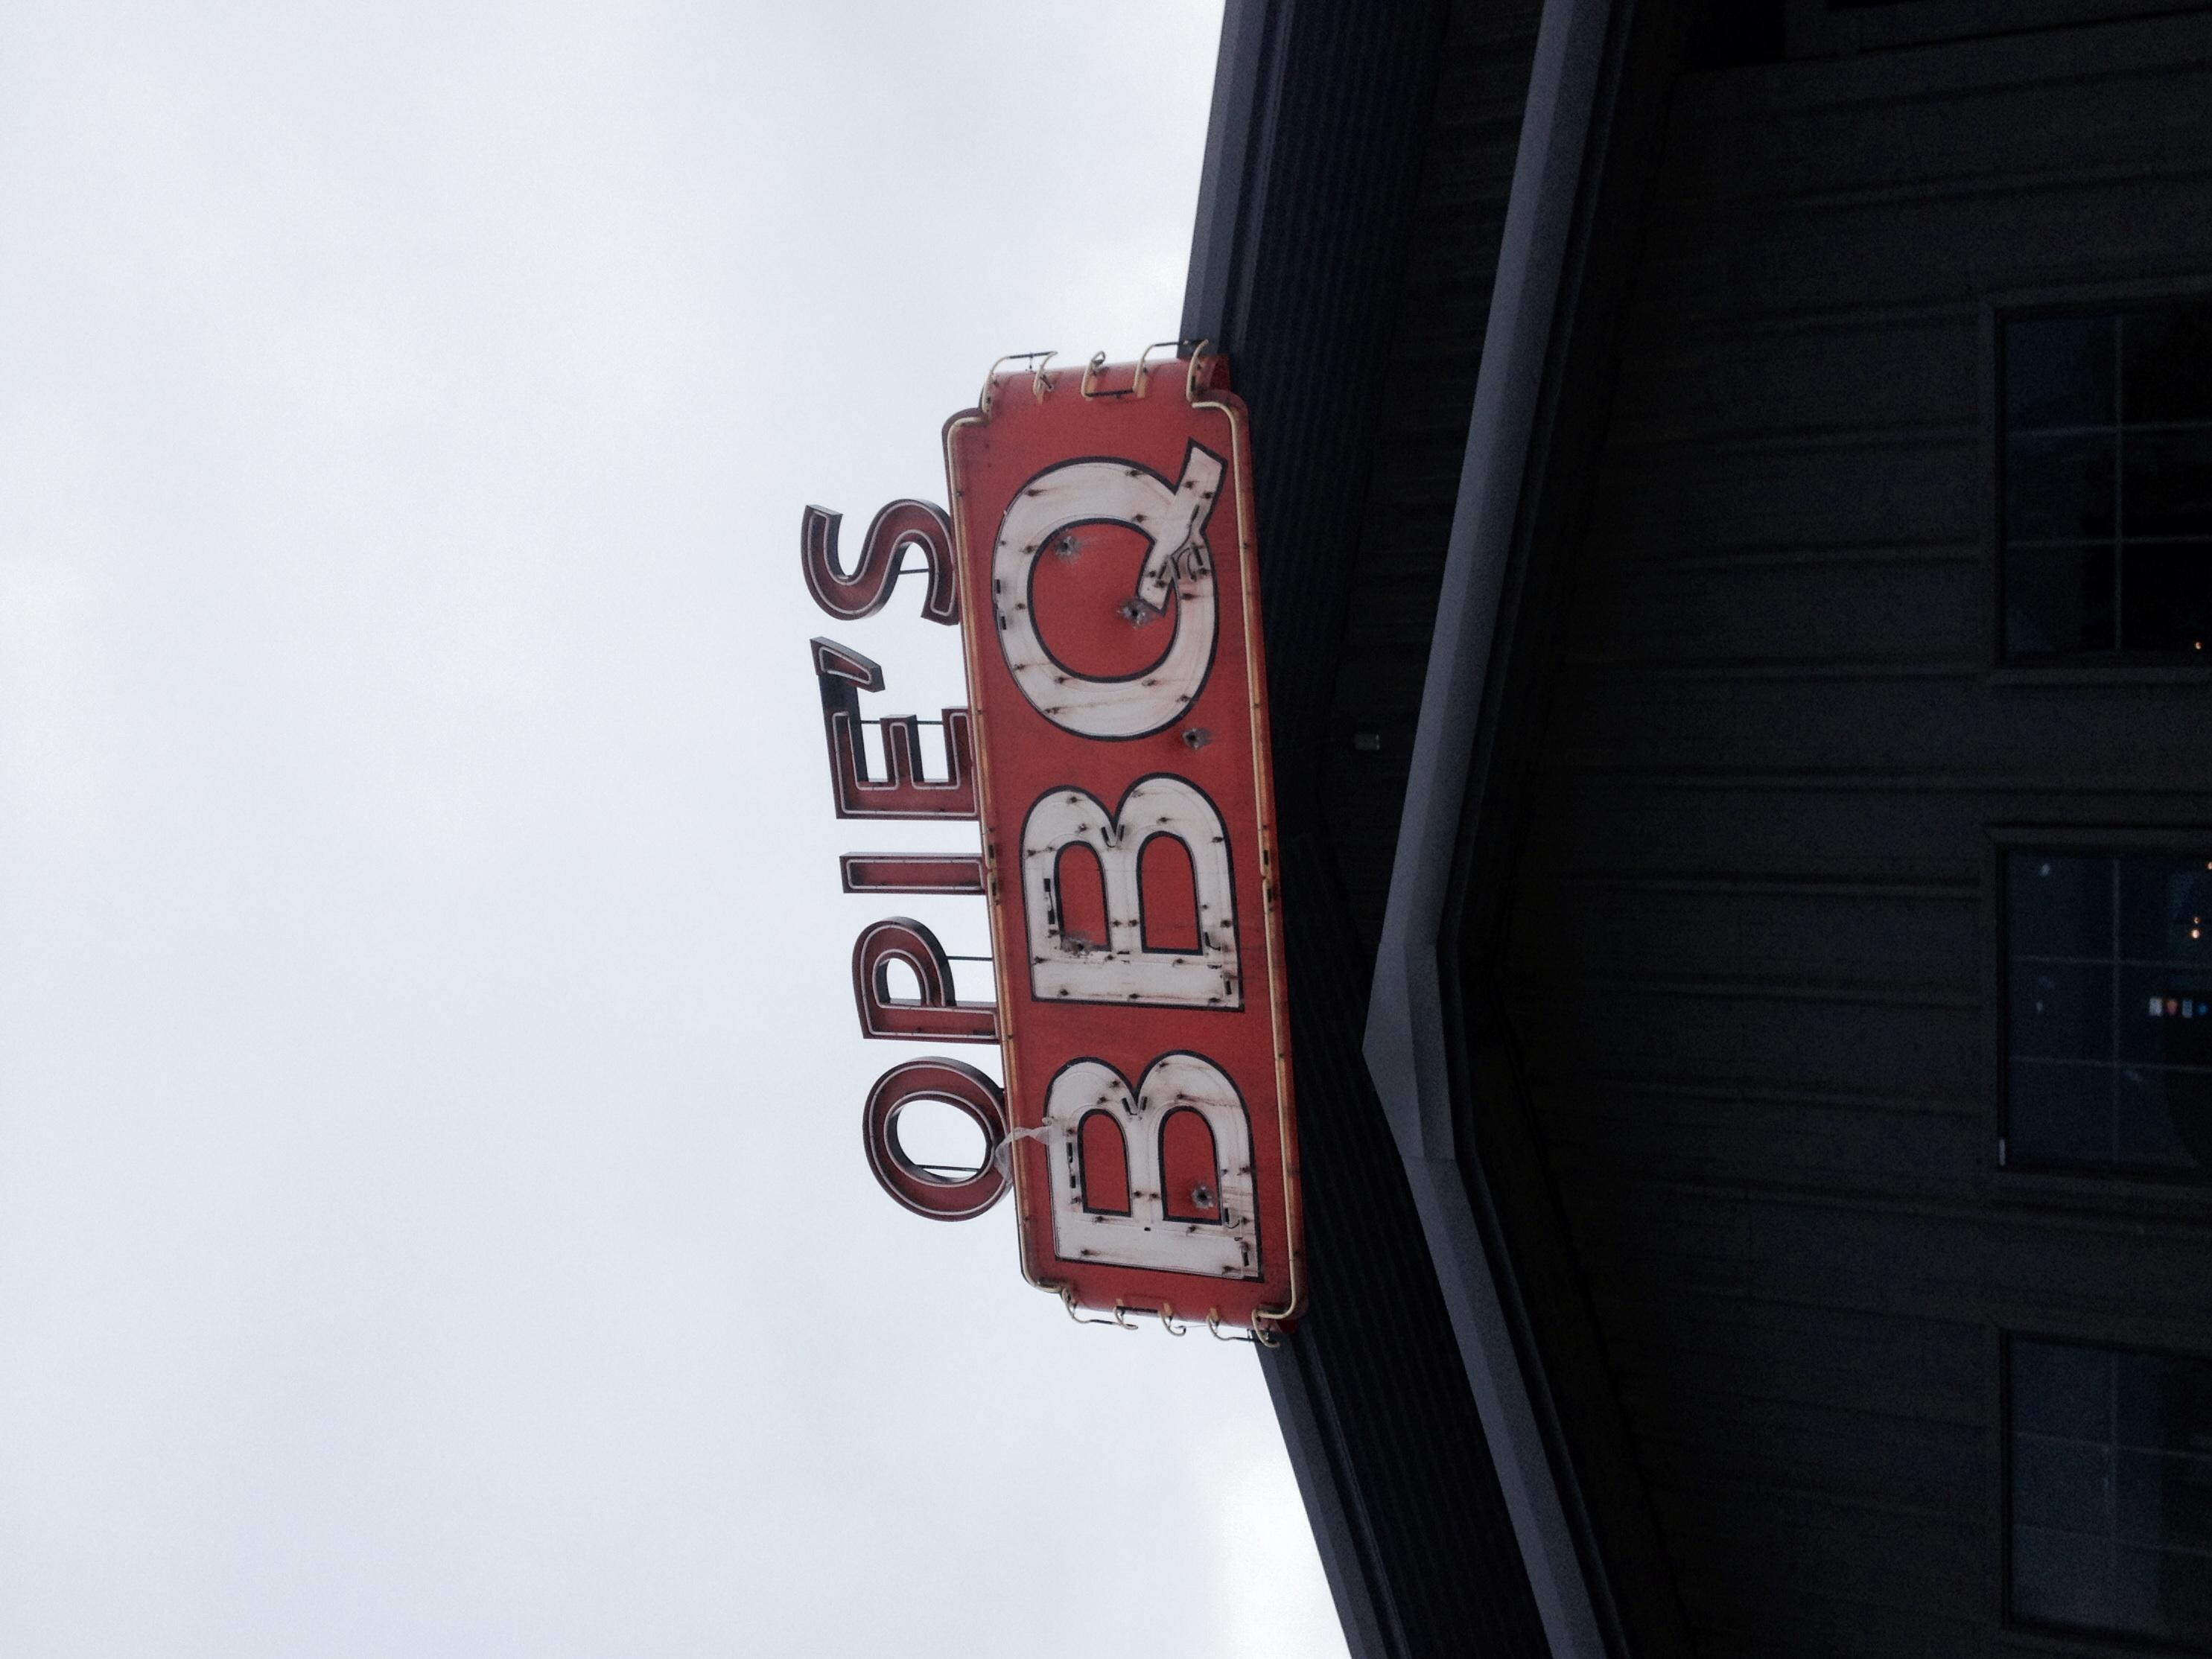 opie's bbq, spicewood, tx